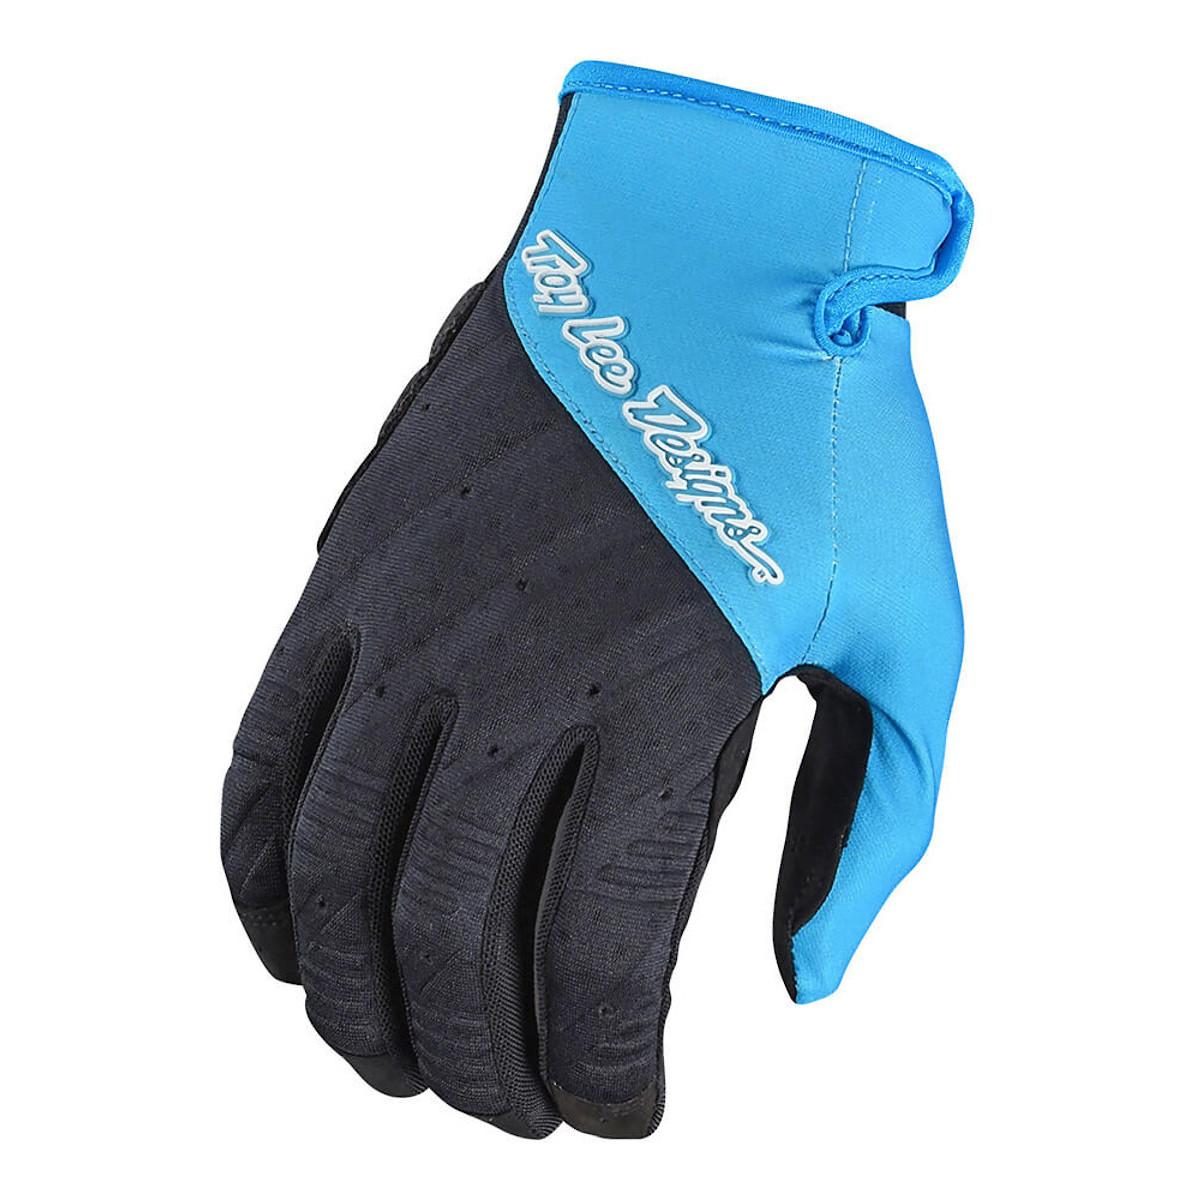 2018-tld-ruckus-glove_BLUE